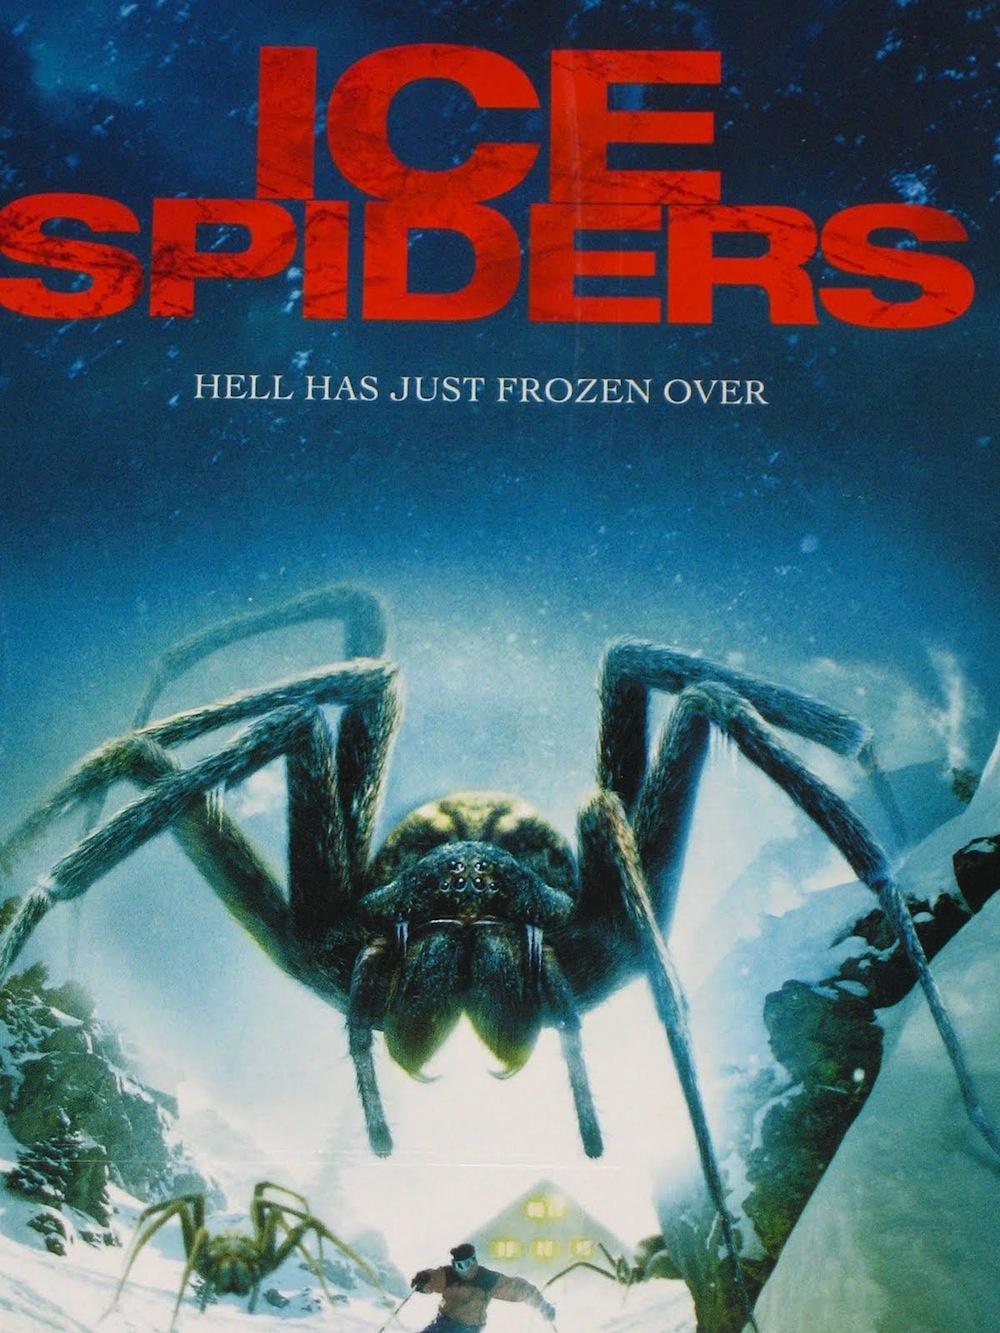 Ice Spiders 2007 Black Horror Movies